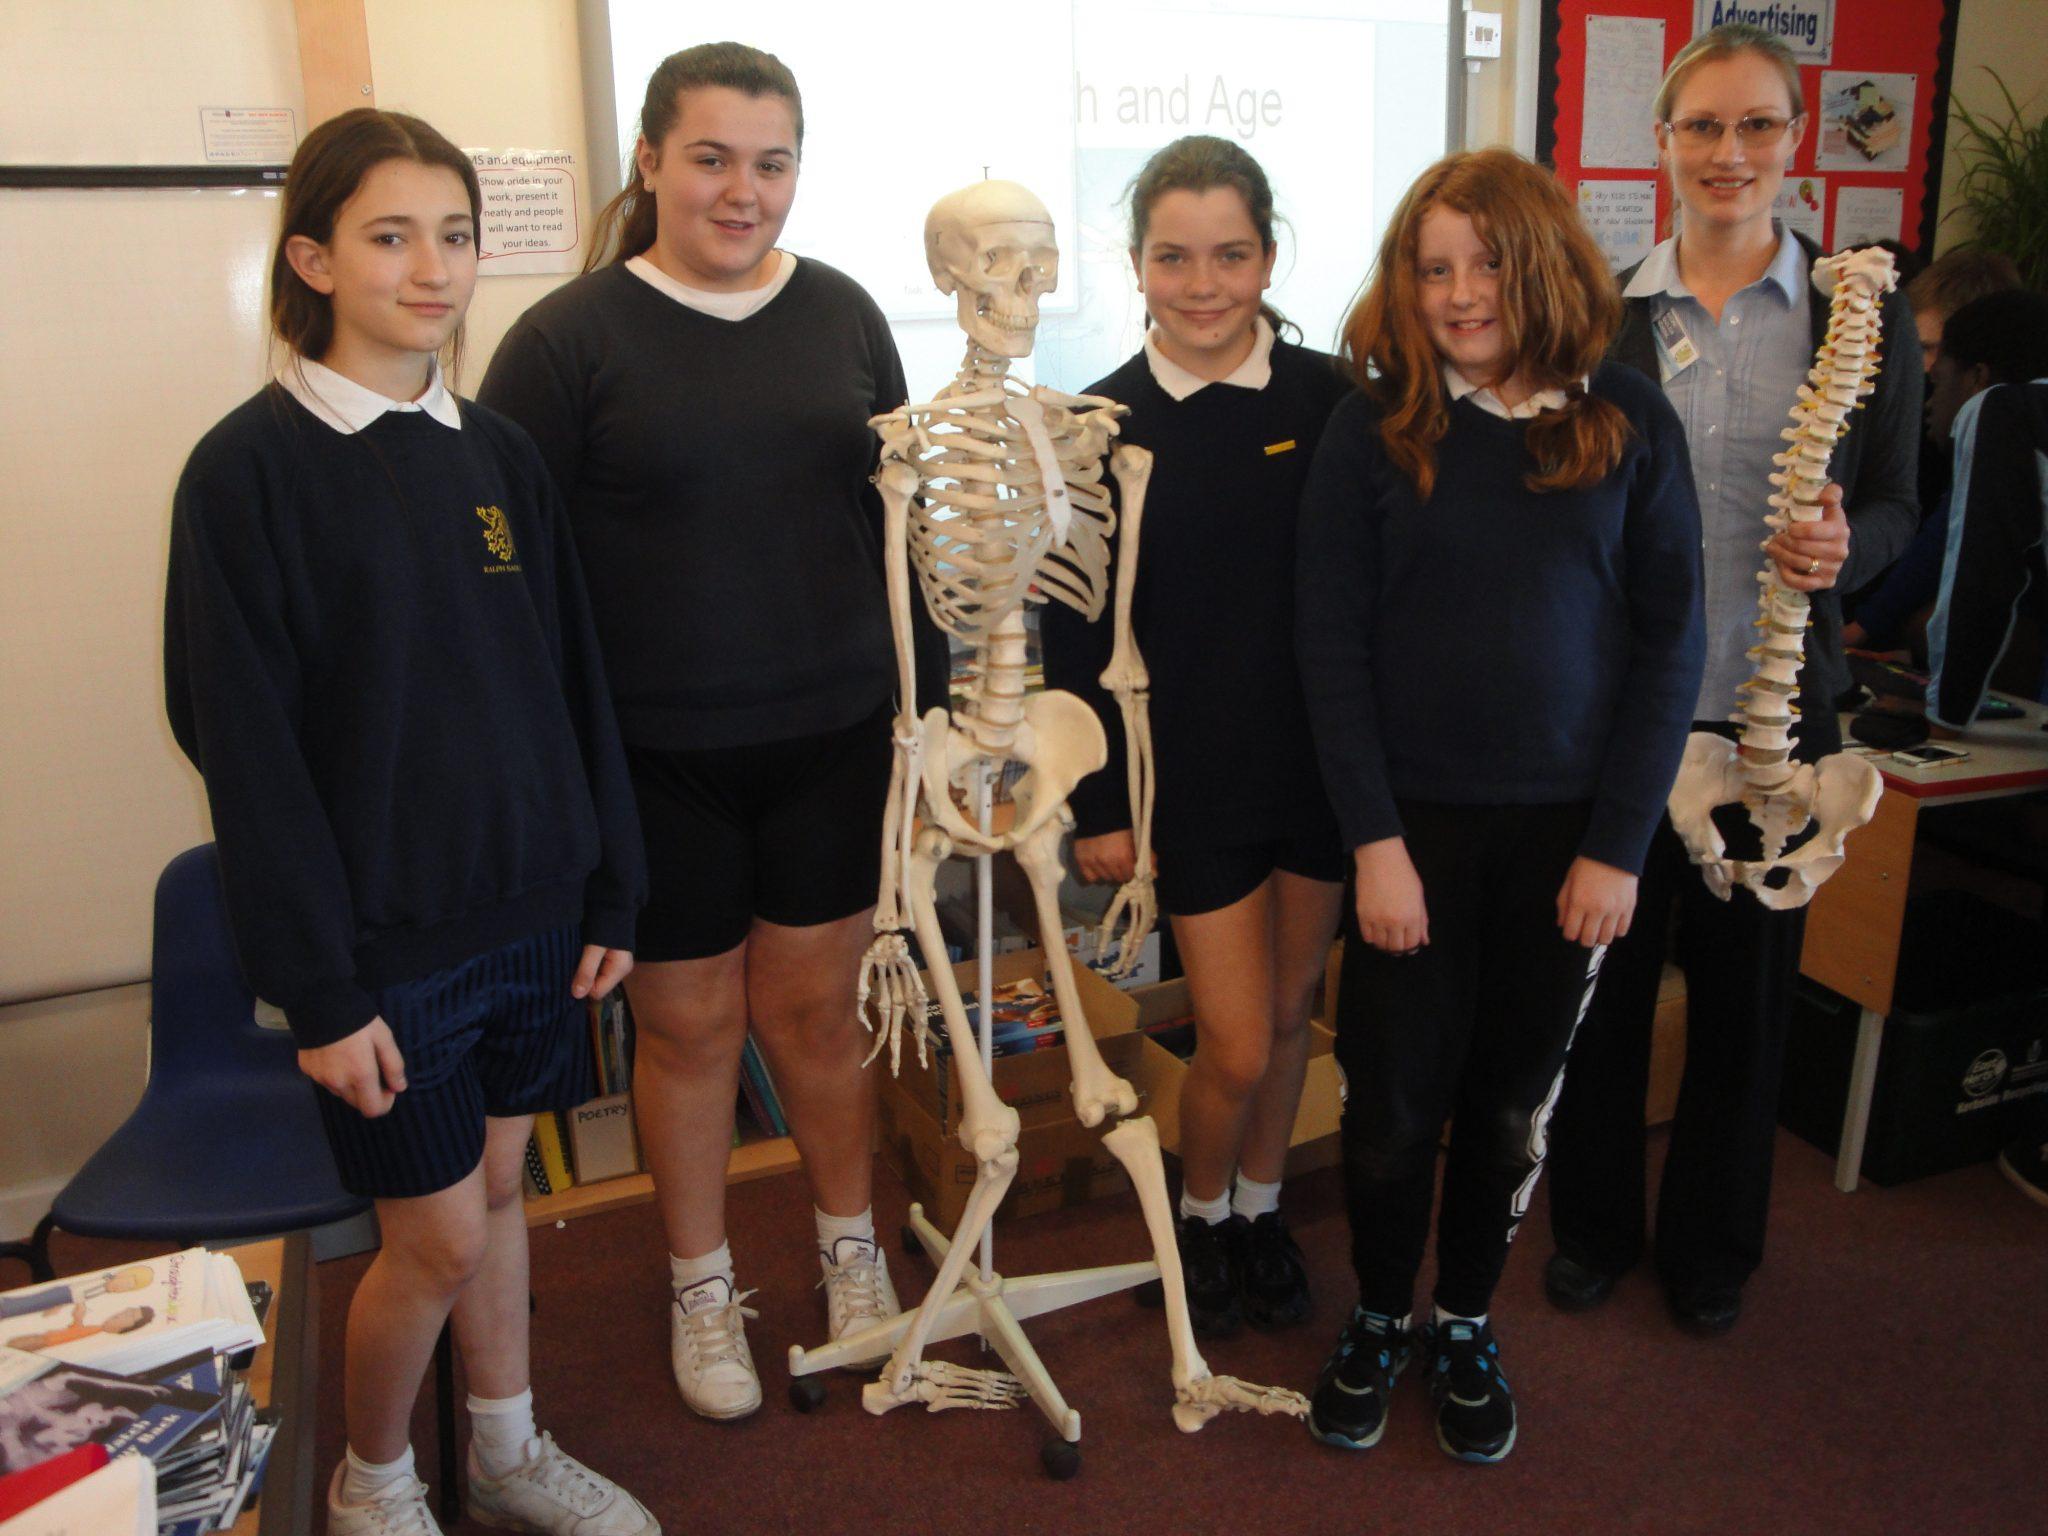 Louise Hampton with pupils from Ralph Sadleir School